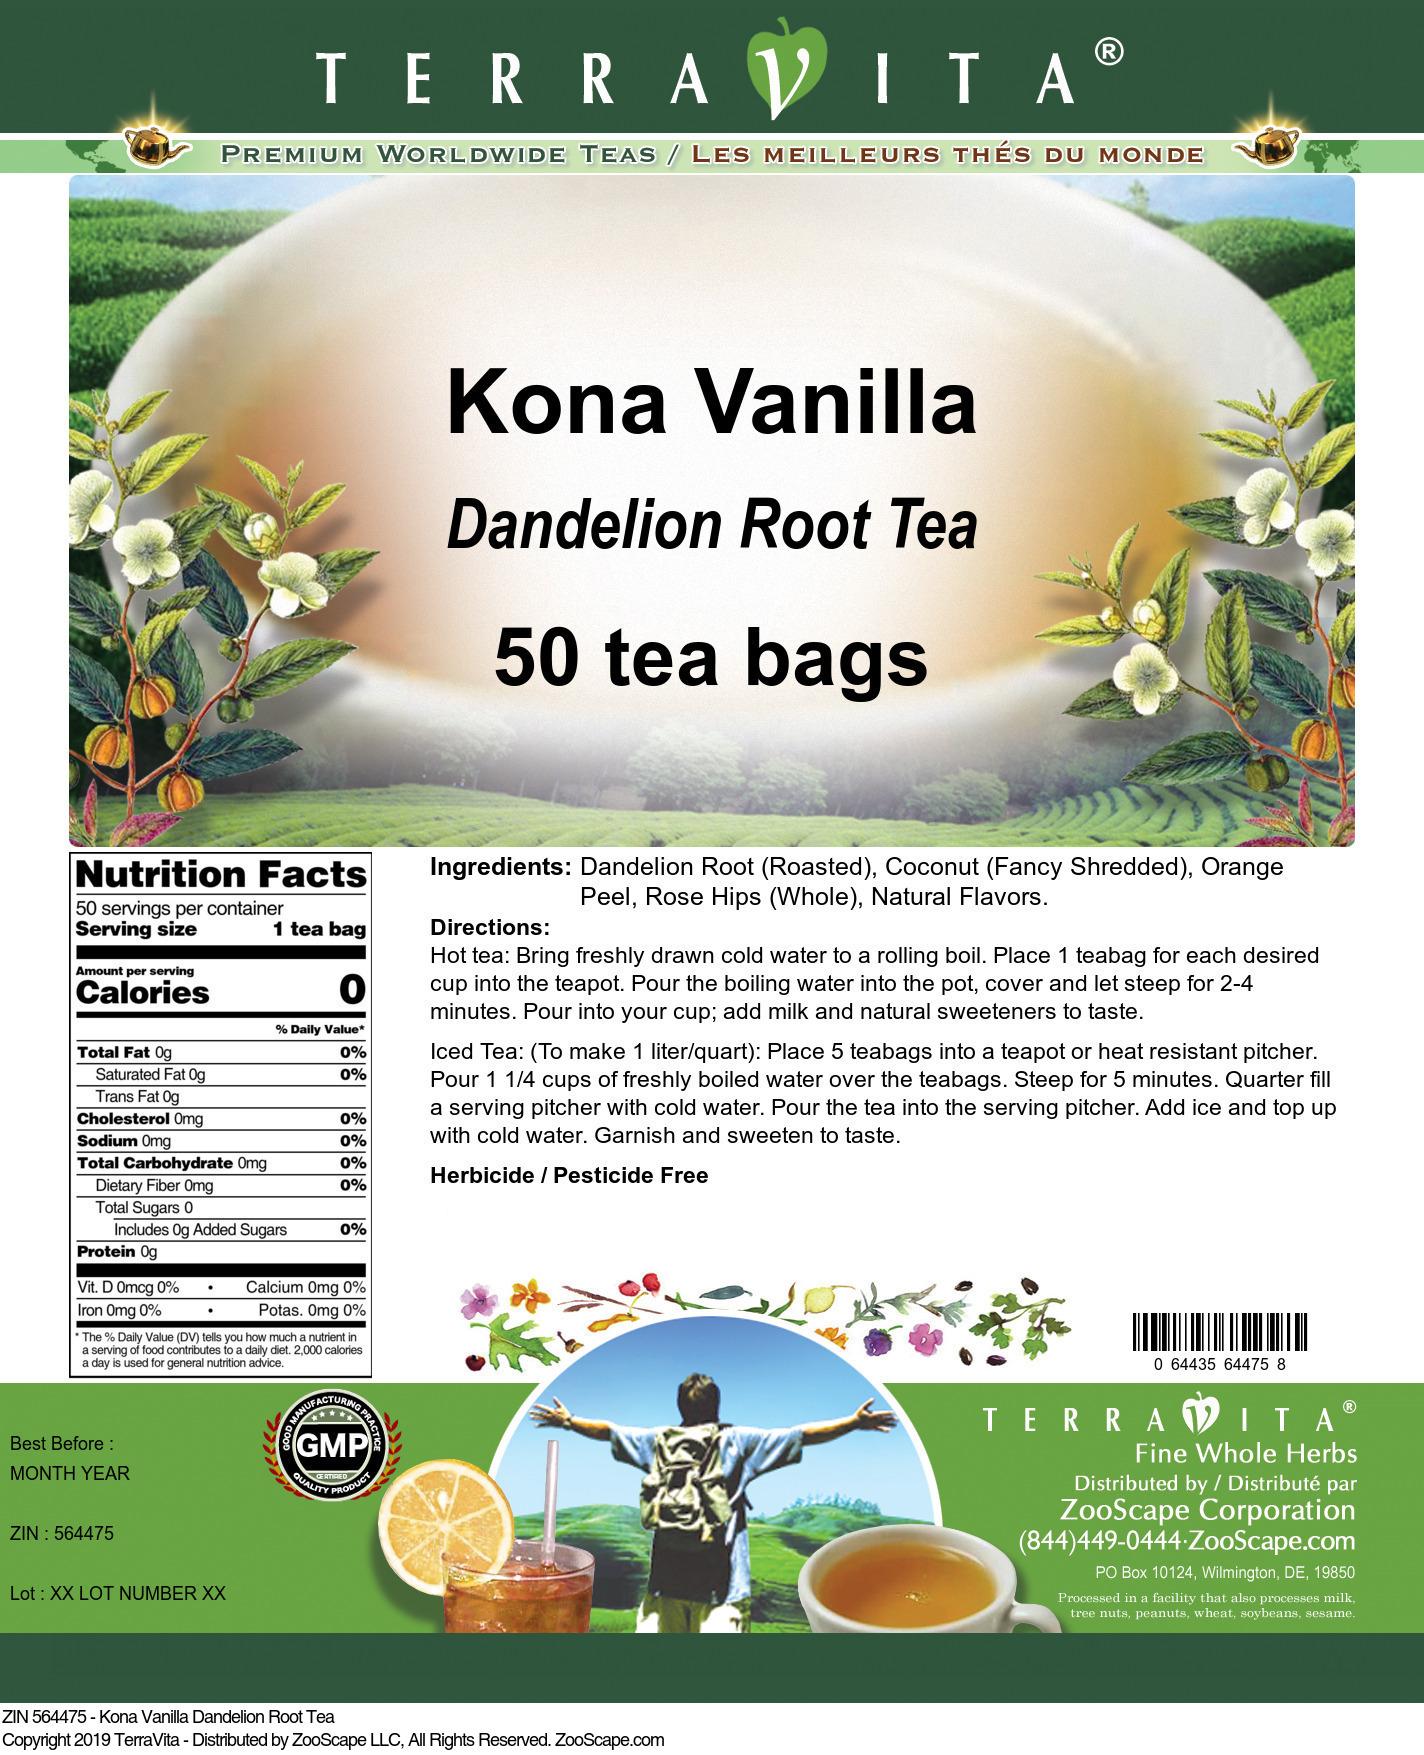 Kona Vanilla Dandelion Root Tea